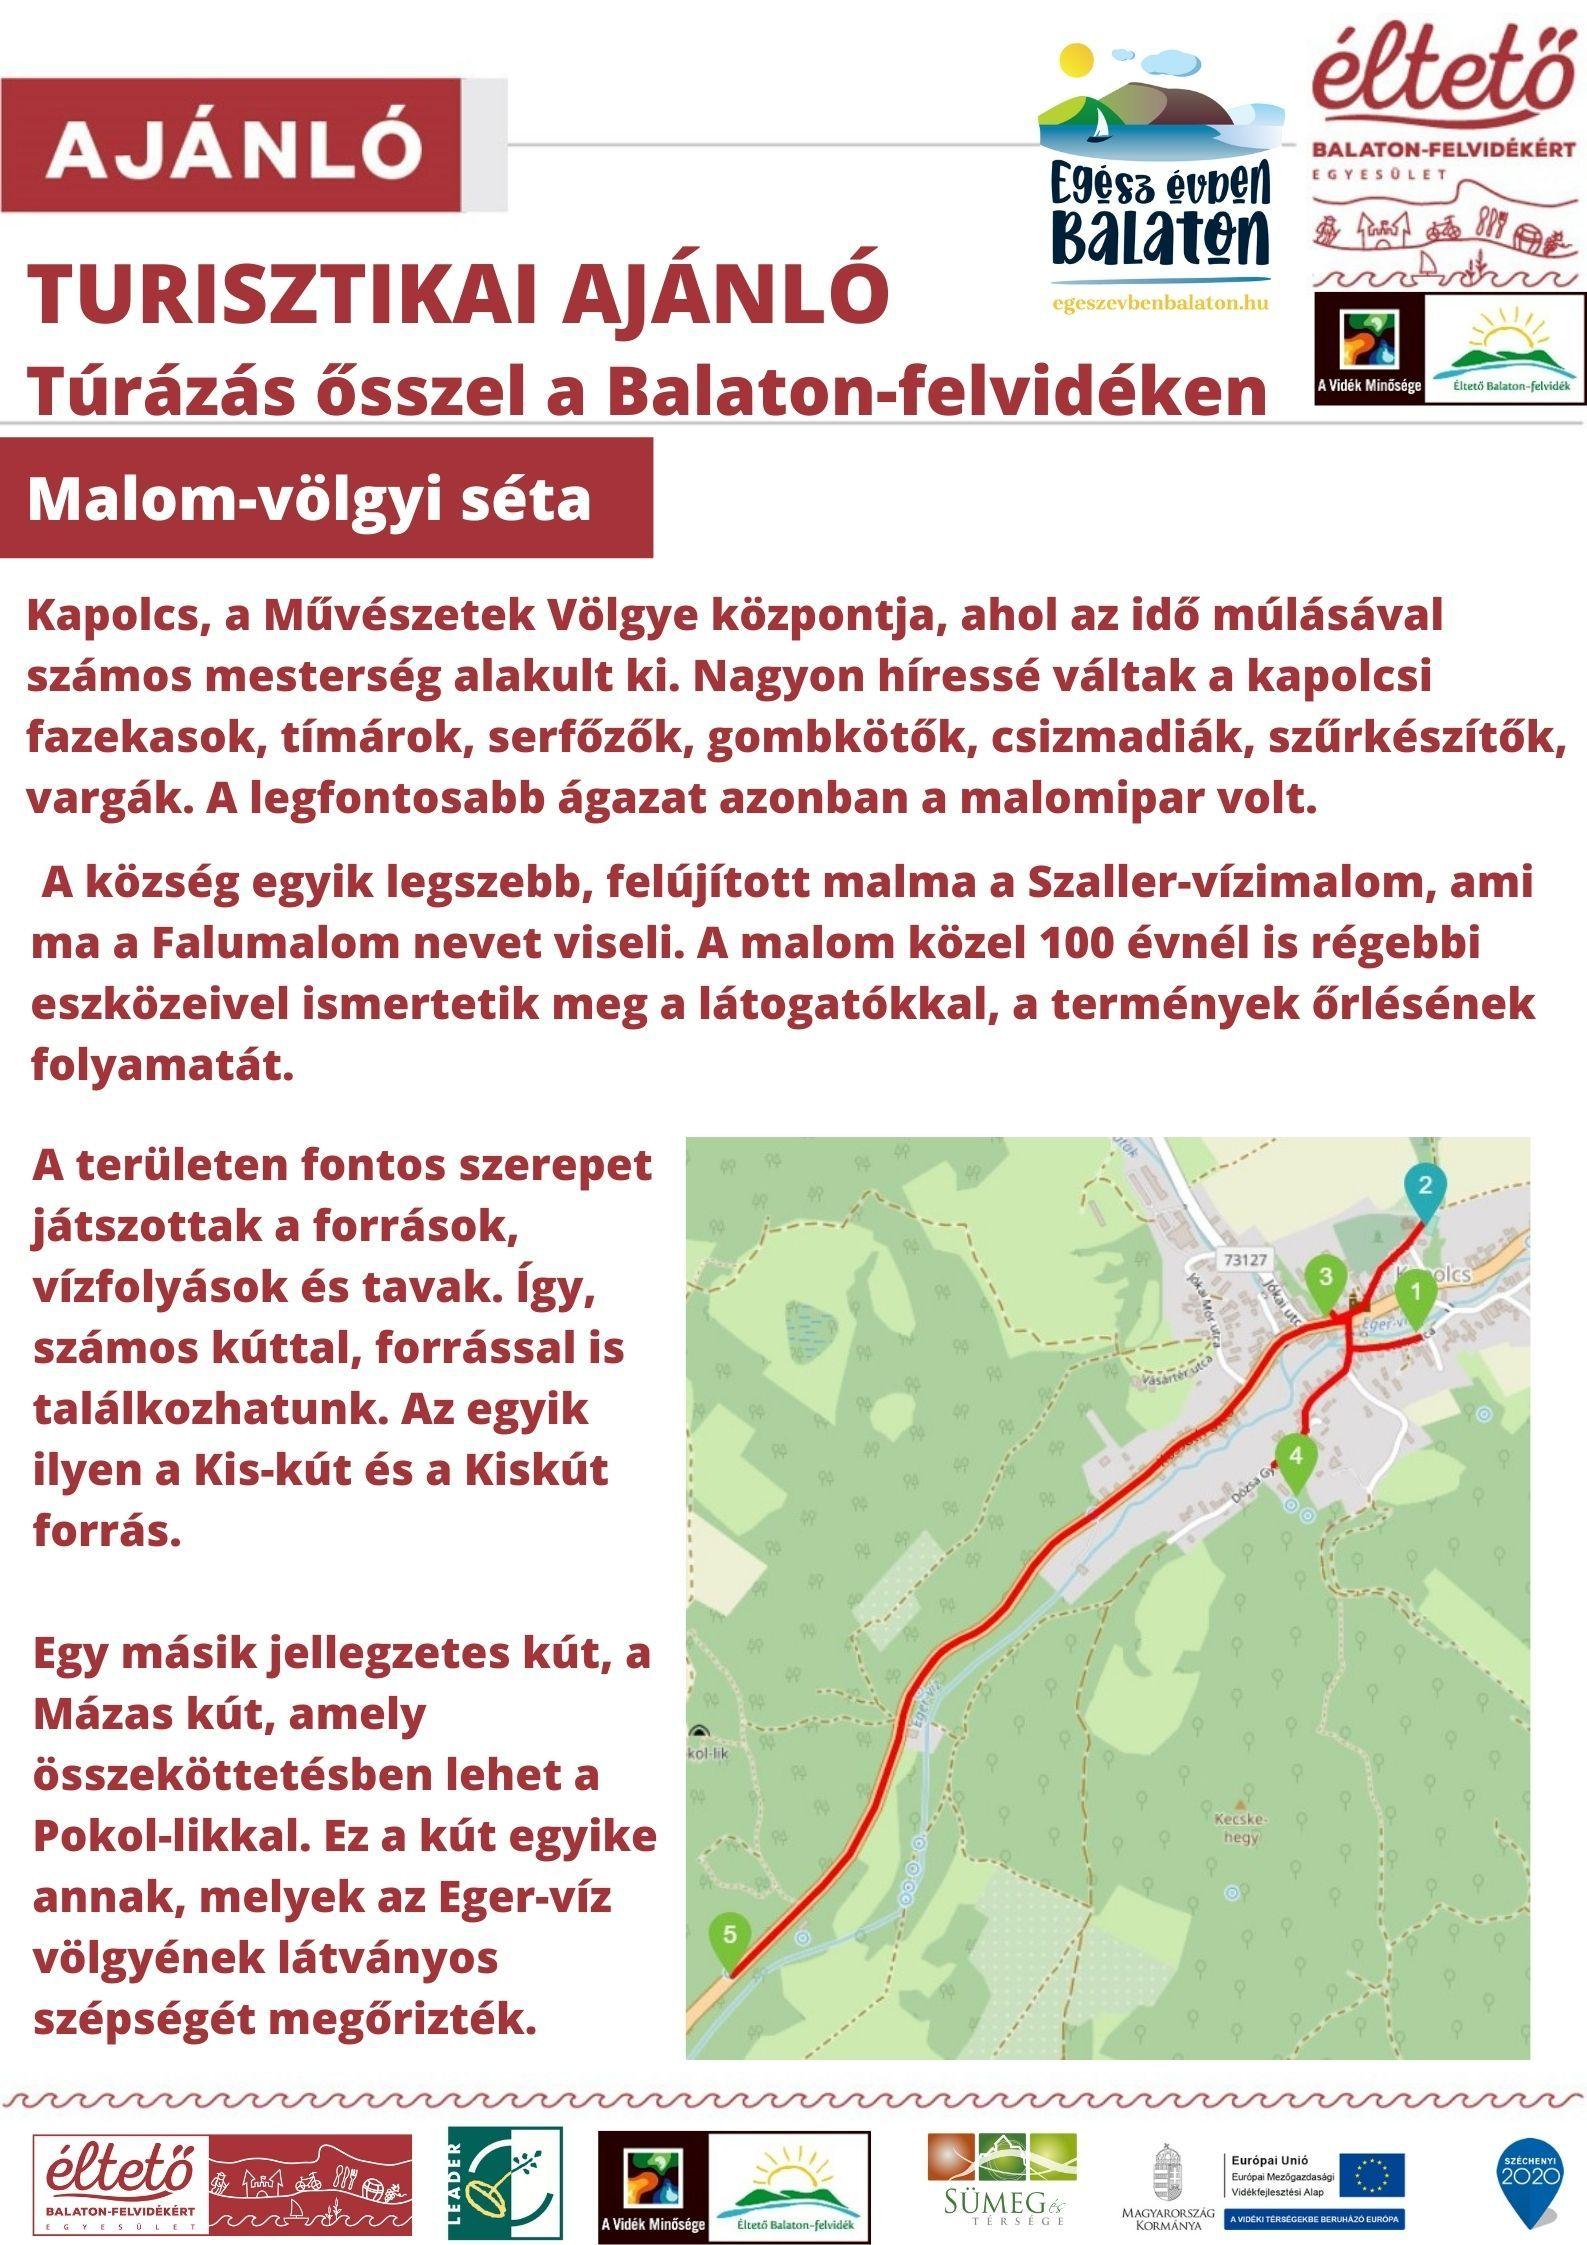 Malom-völgyi séta